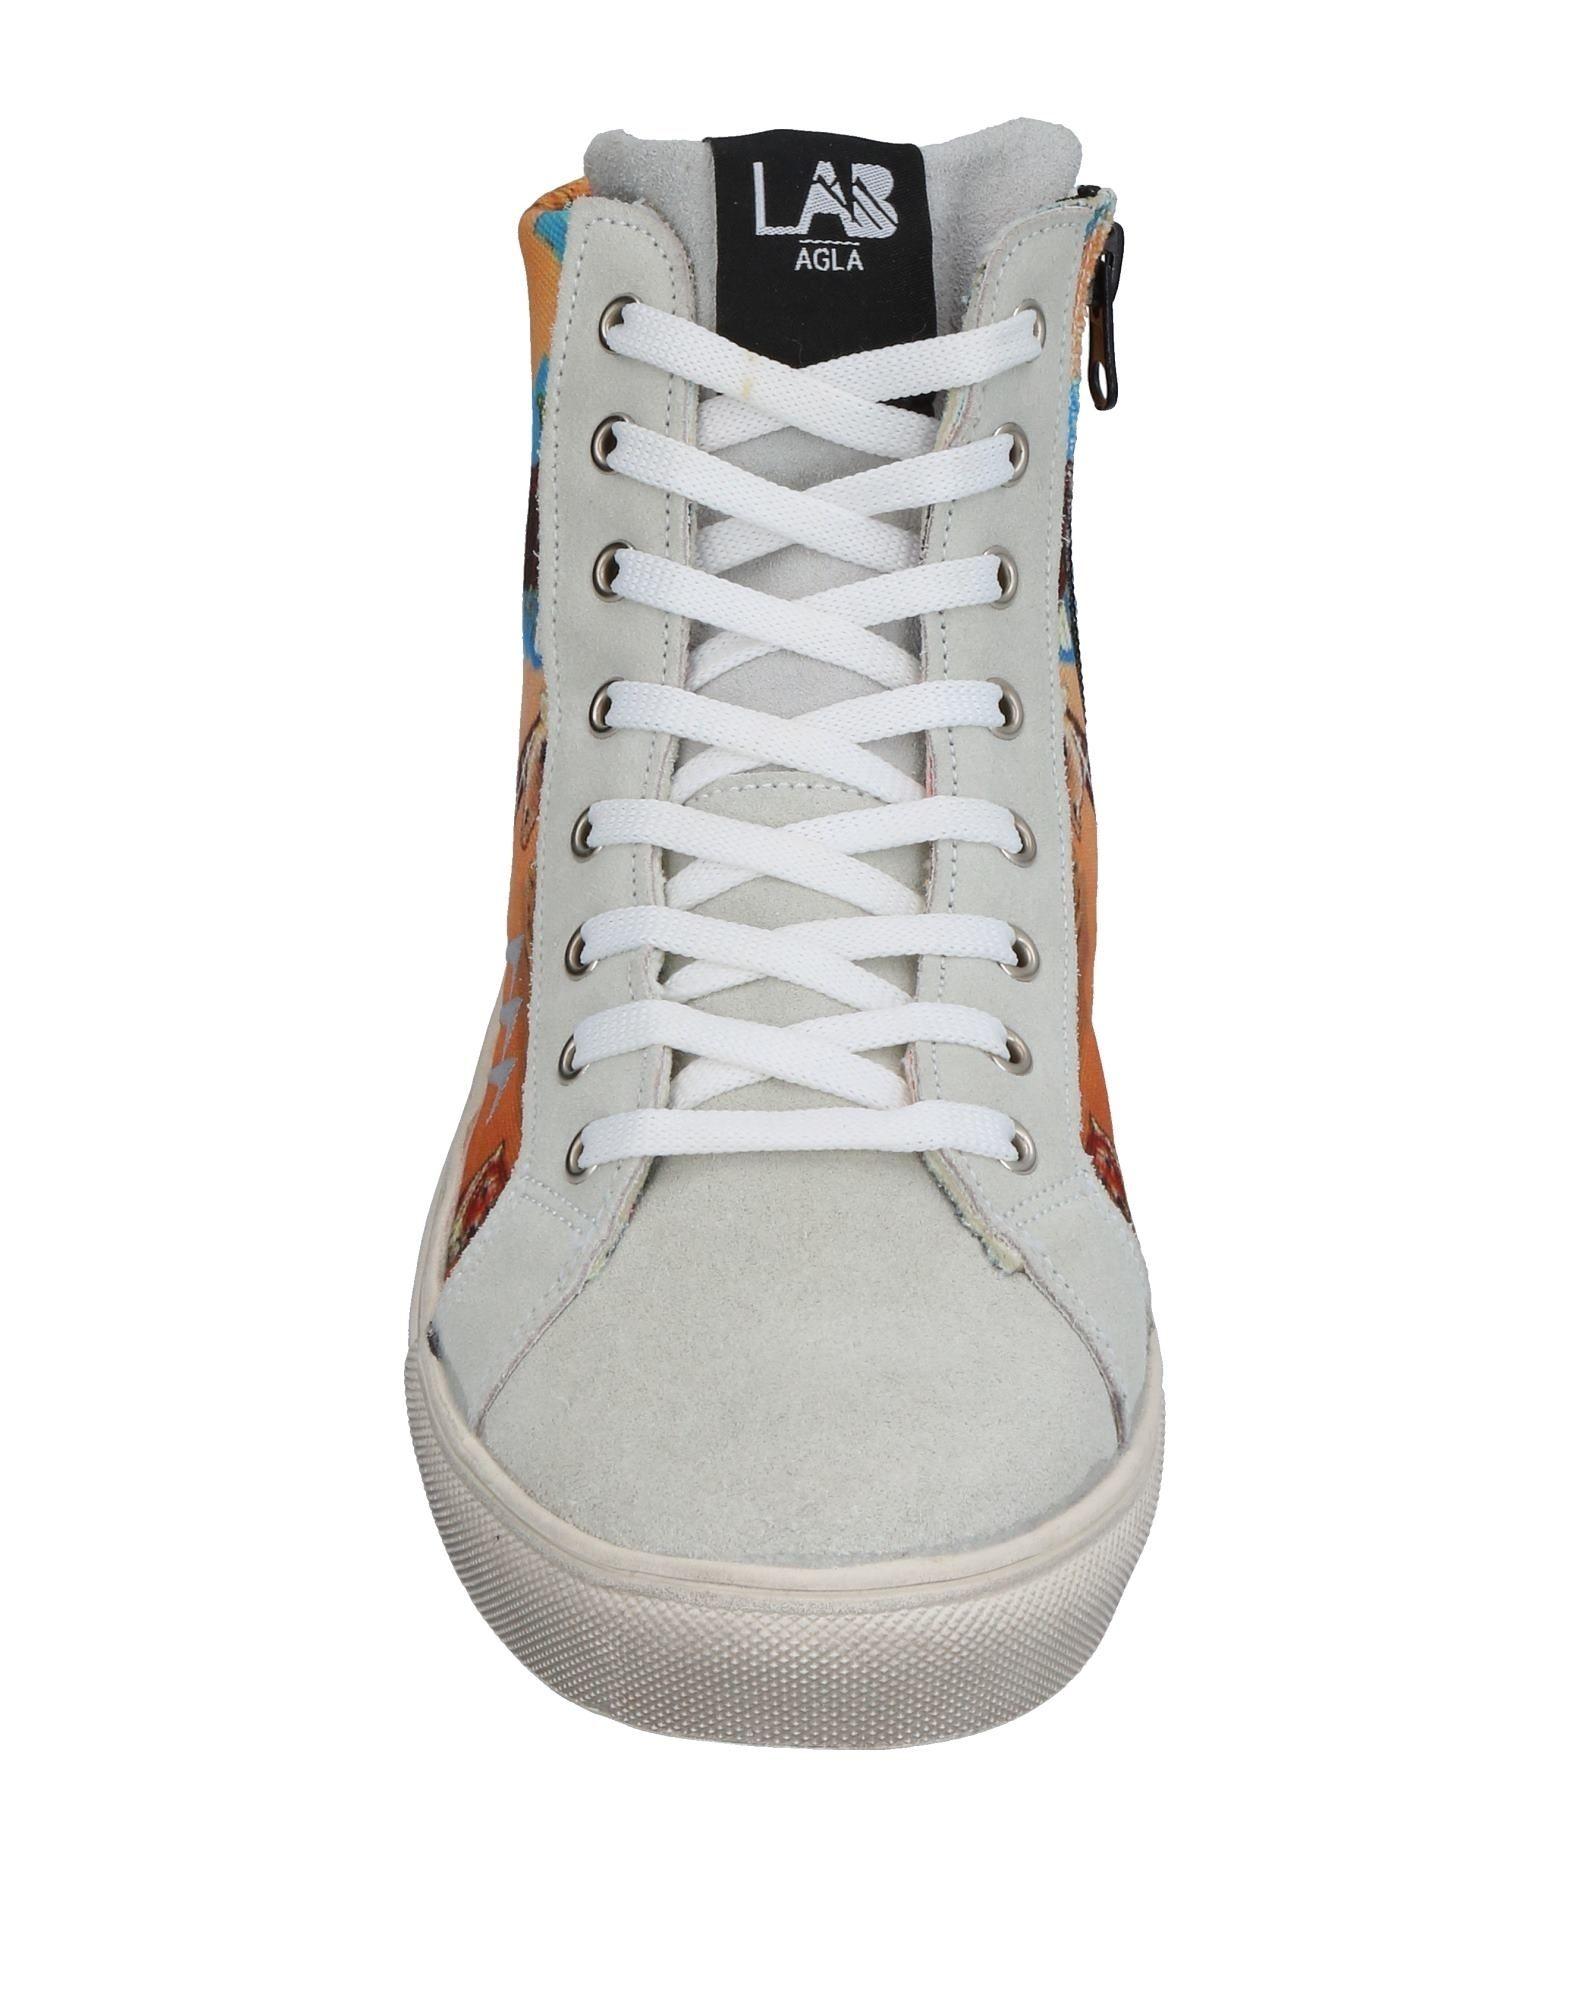 Lab By Agla Sneakers Agla - Men Lab By Agla Sneakers Sneakers online on  United Kingdom - 11380047XA 23639e